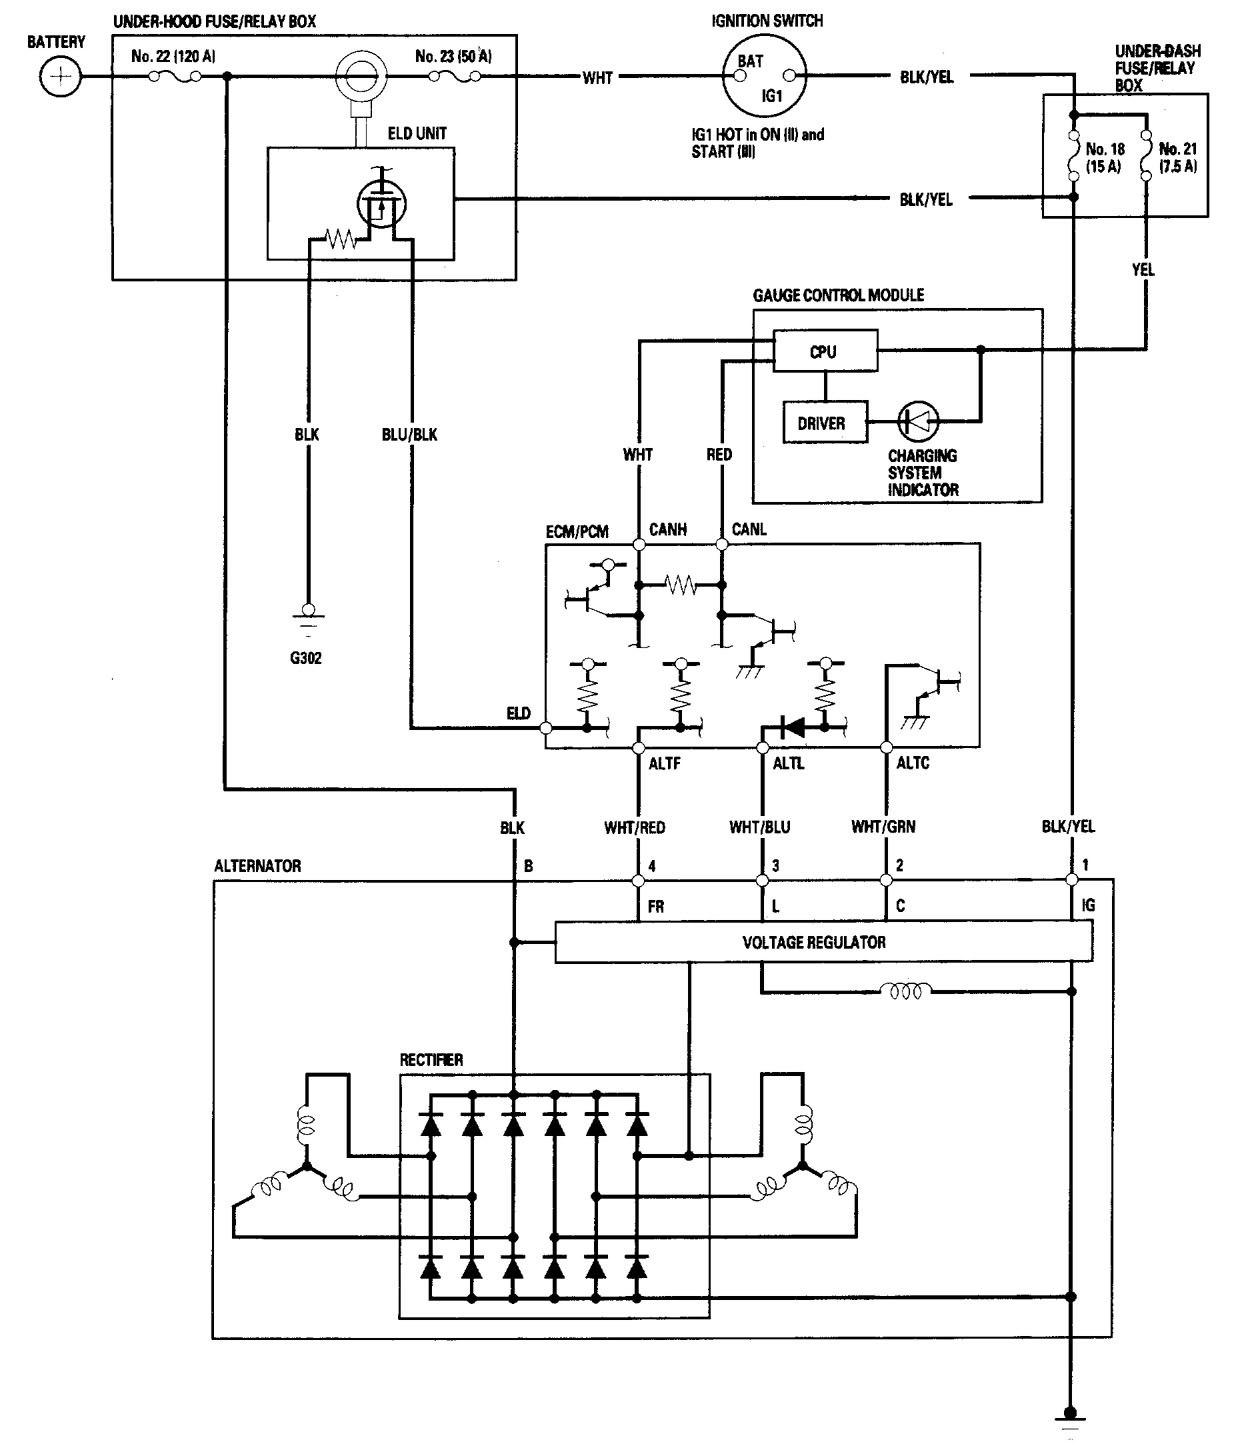 DIAGRAM] Acura Tl Alarm Wiring Diagram FULL Version HD Quality Wiring  Diagram - CIRCUTDIAGRAMS.I-RAS.IT | Acura Rsx Alarm Wiring Diagram |  | i-ras.it